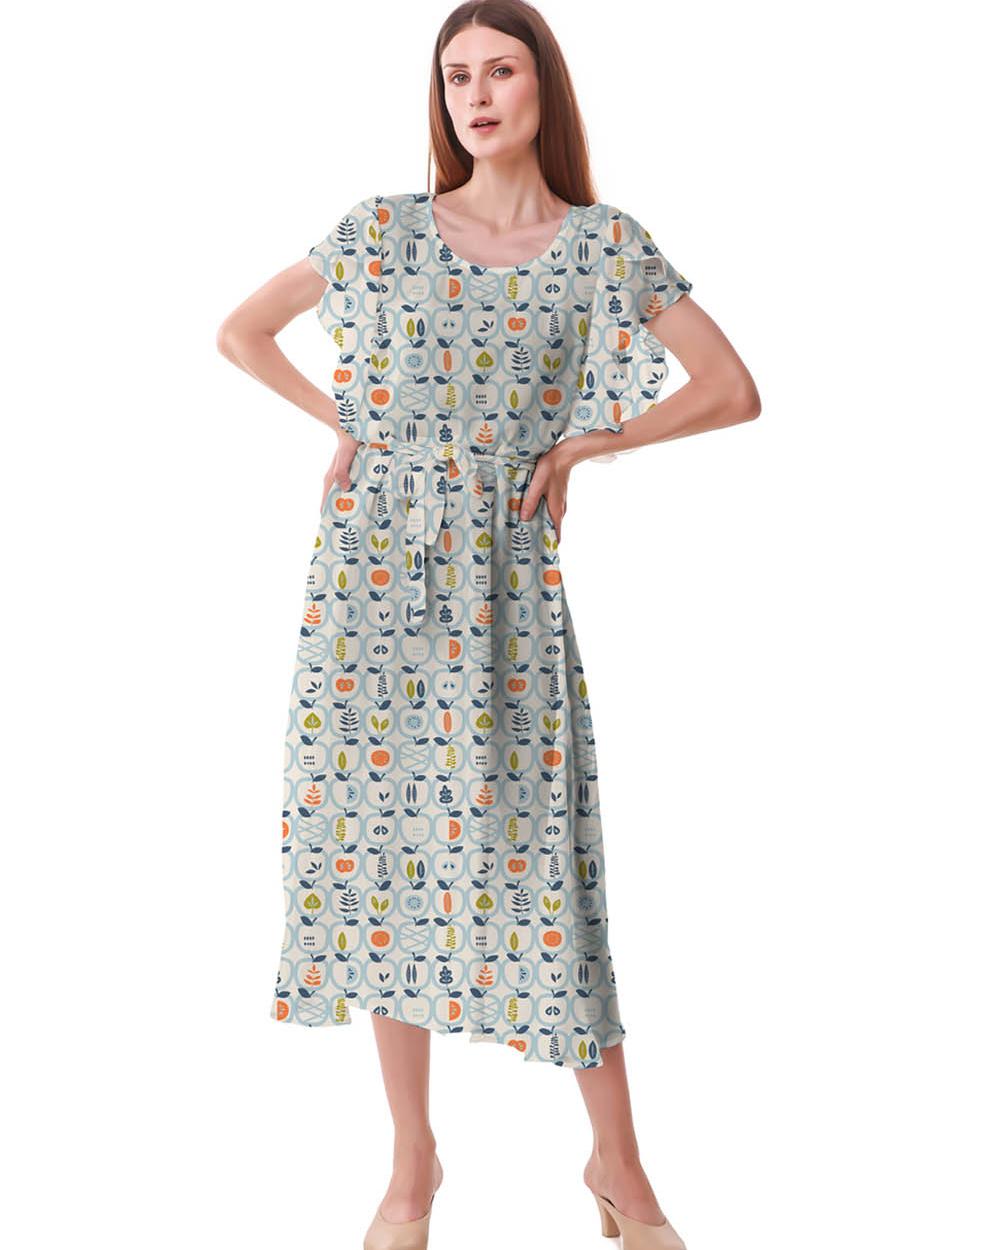 junctionstore/ravirajoria/dress